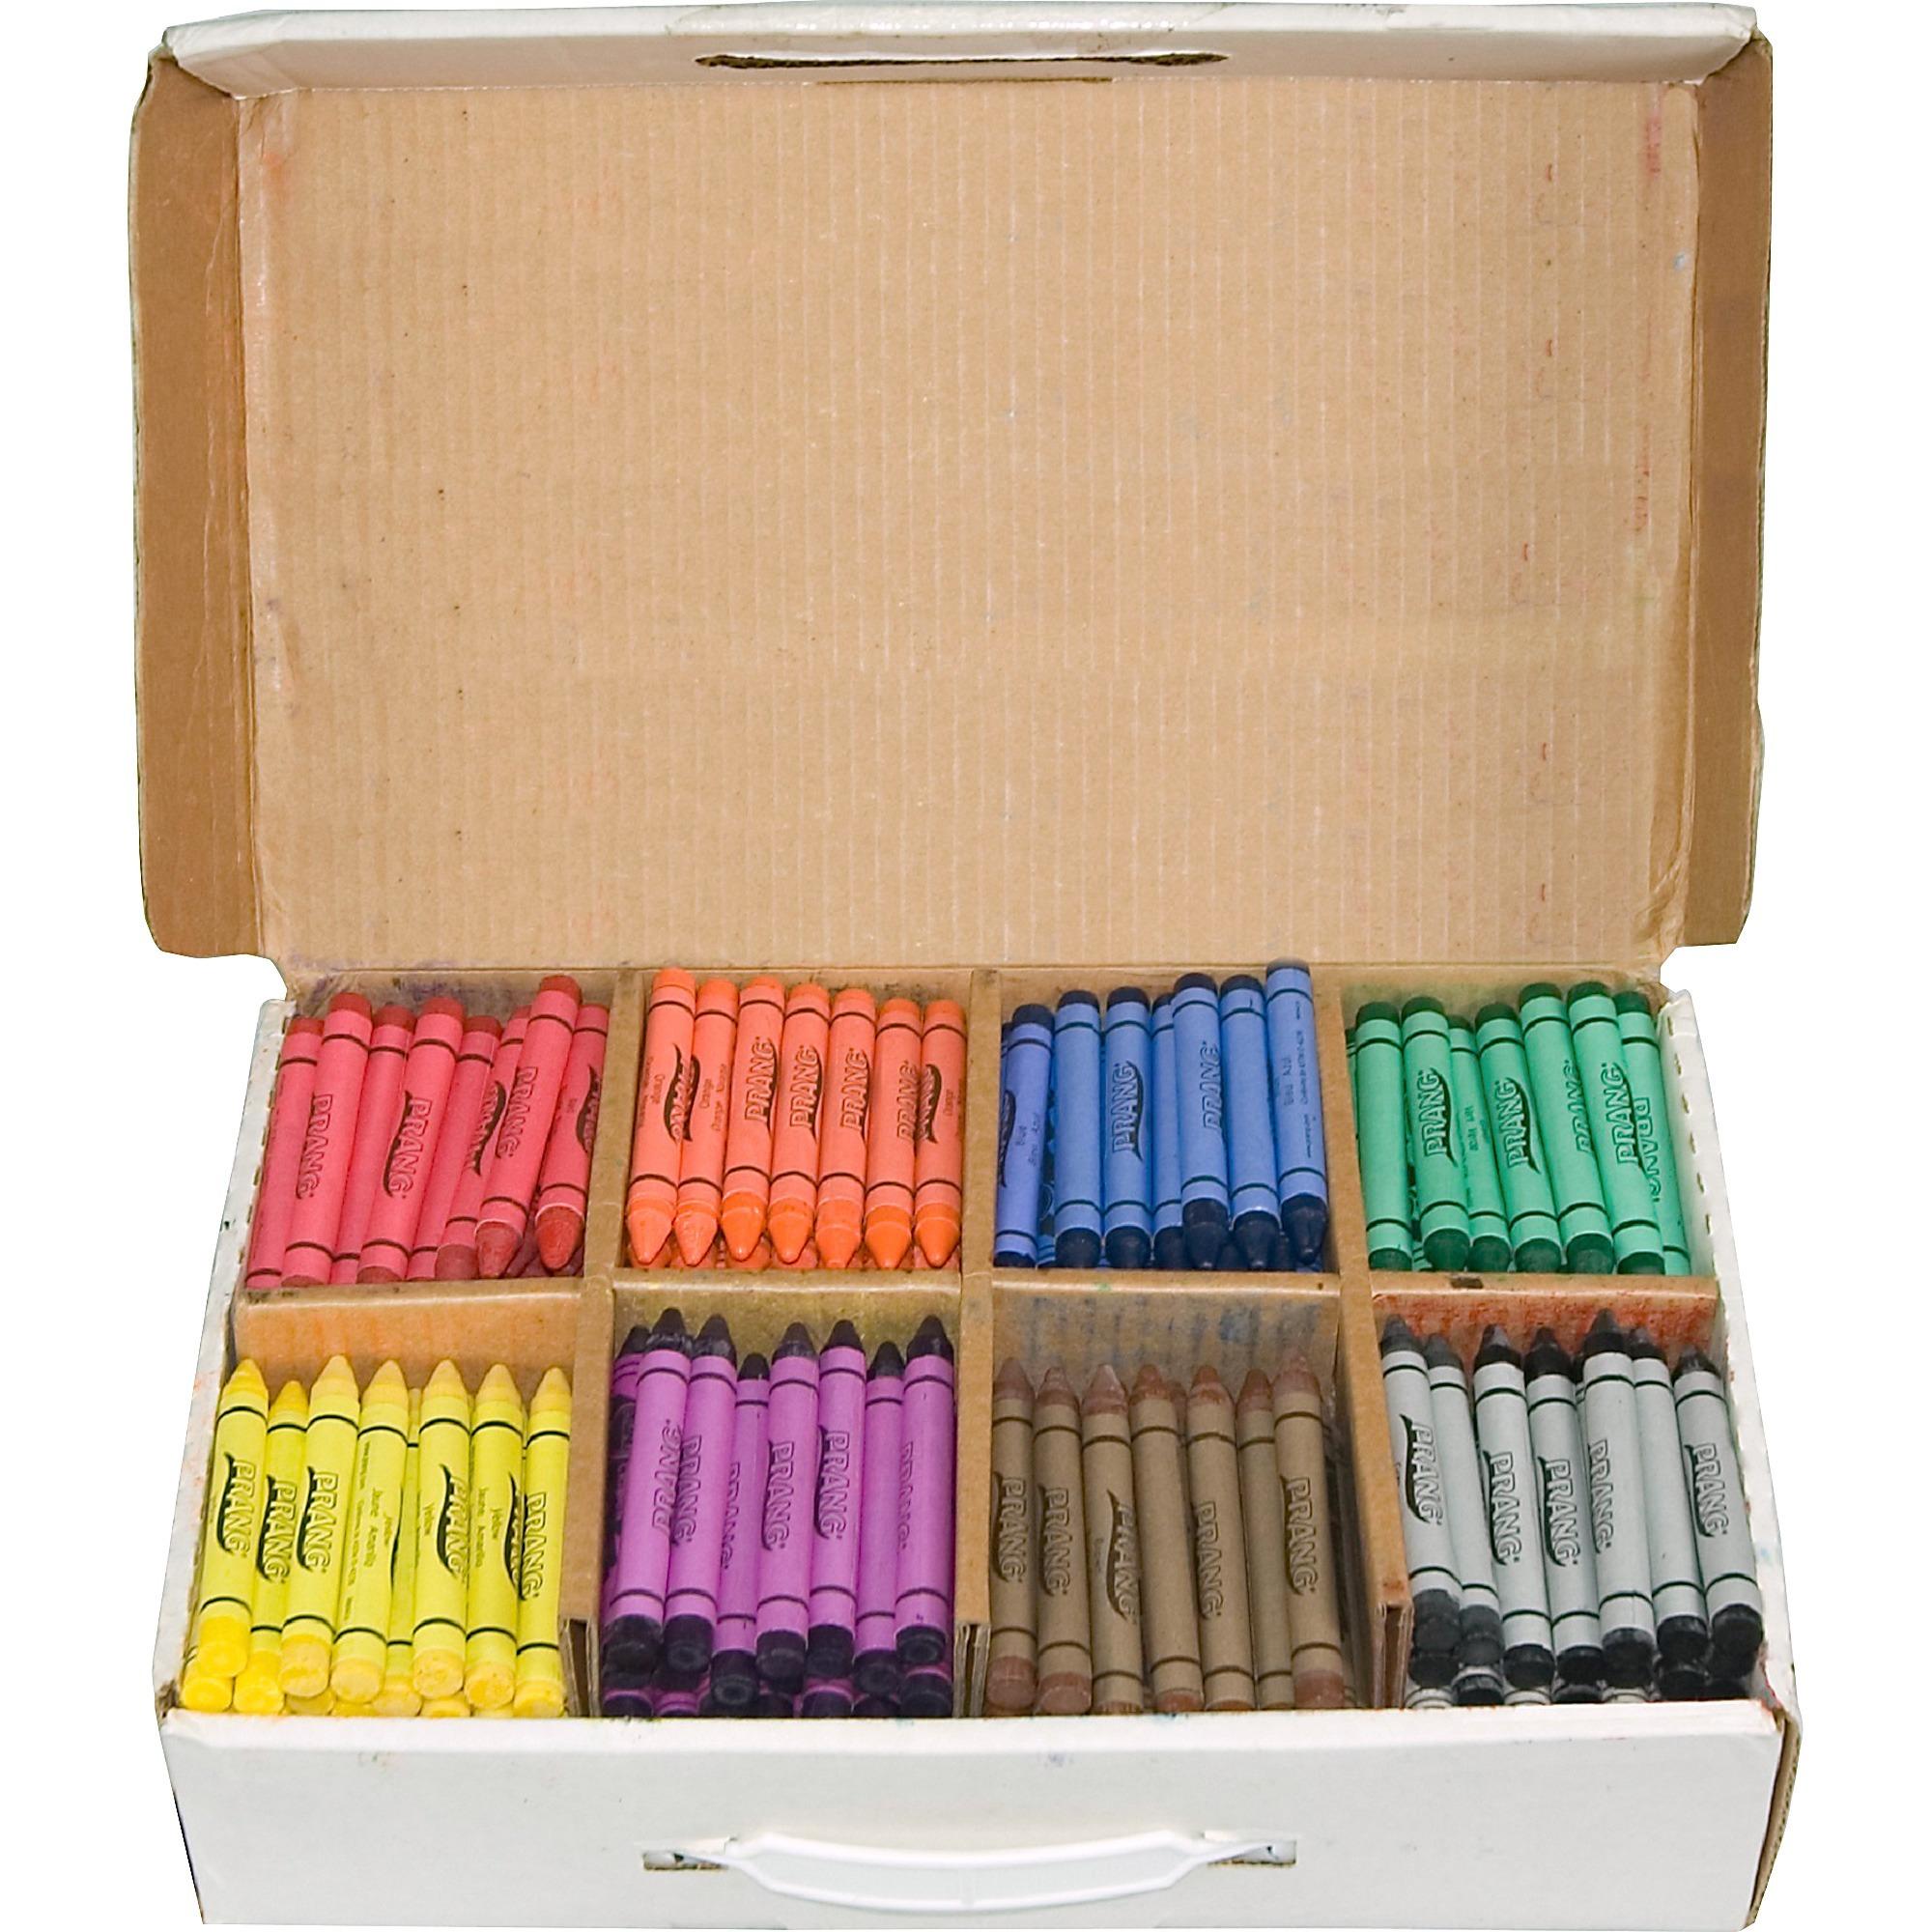 Prang, DIX32351, Master Pack Regular Crayons, 400 / Box, Assorted